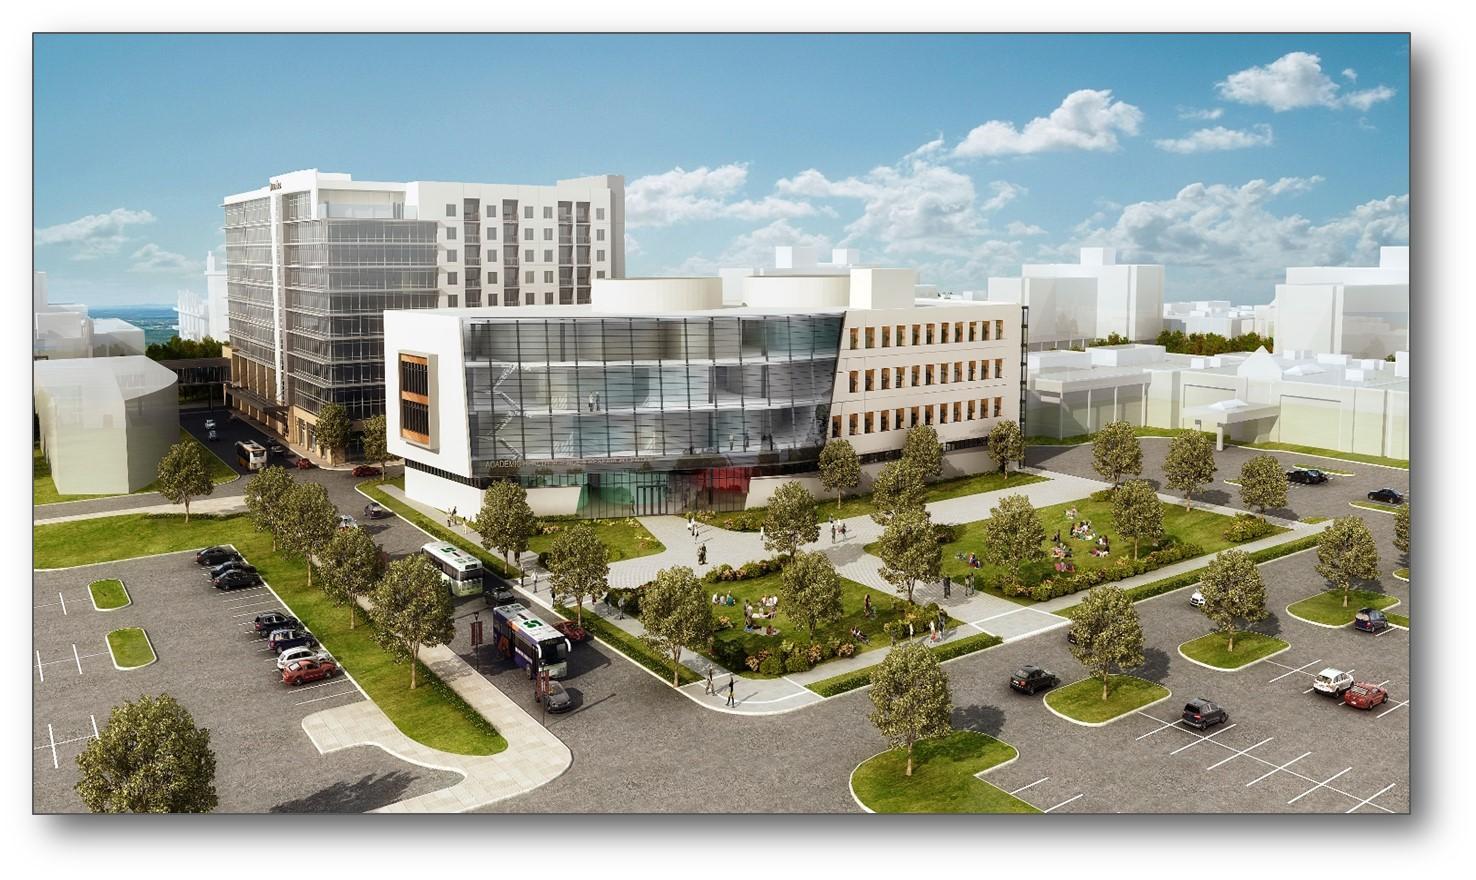 IU Medical School to downtown Evansville - 14news.com